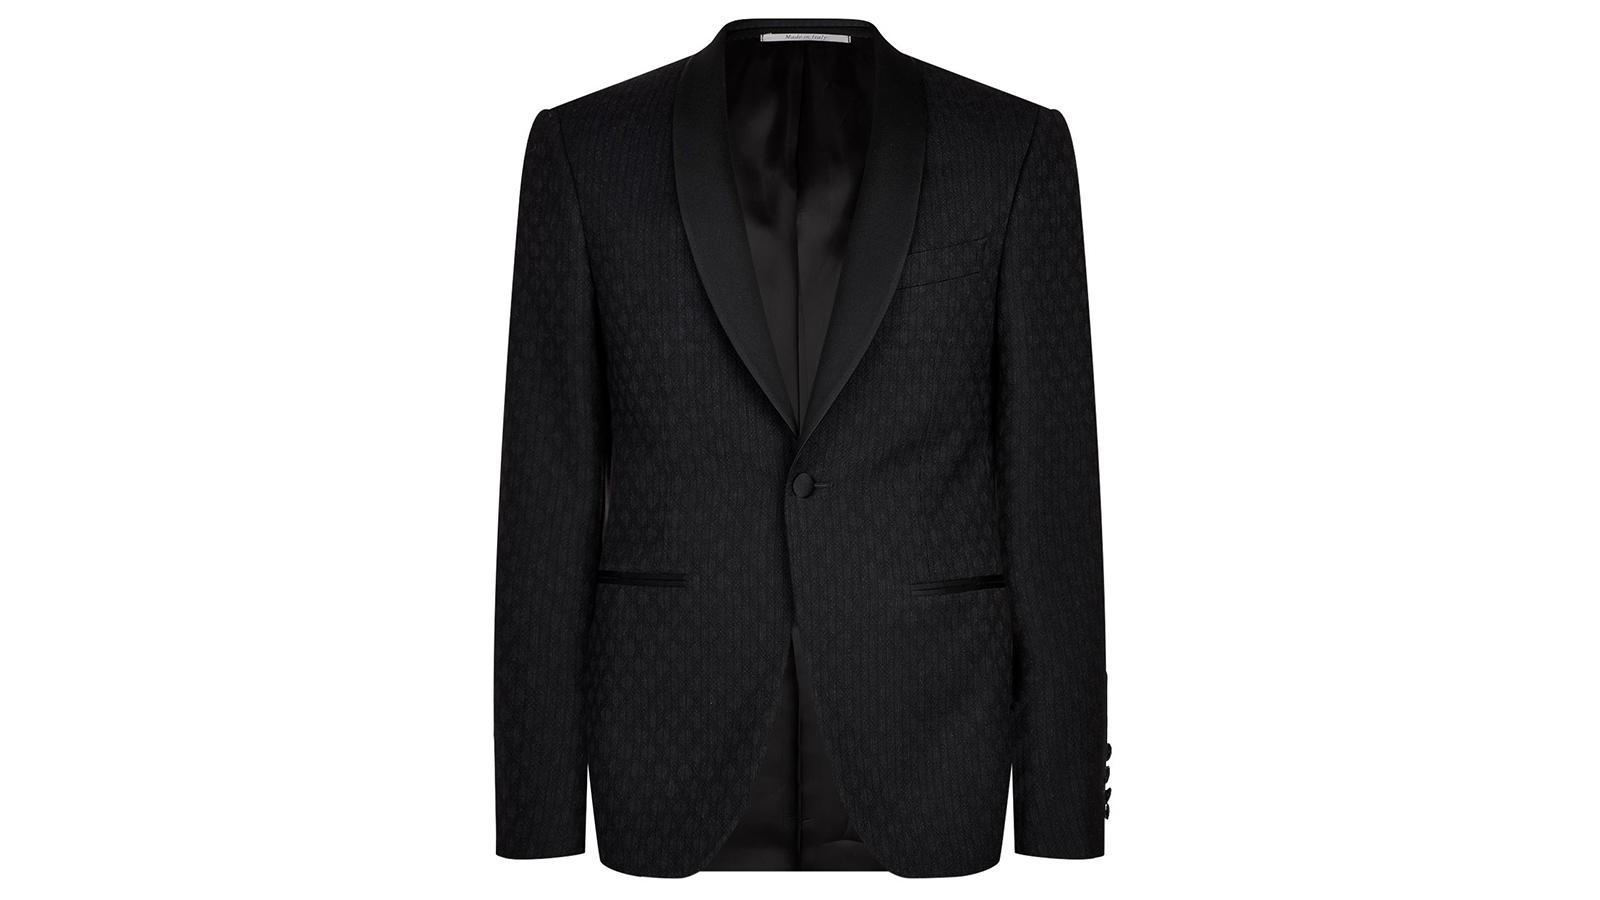 UBZOVpYTvuTdcCoLdG0P canali evening jacket 2560x1440